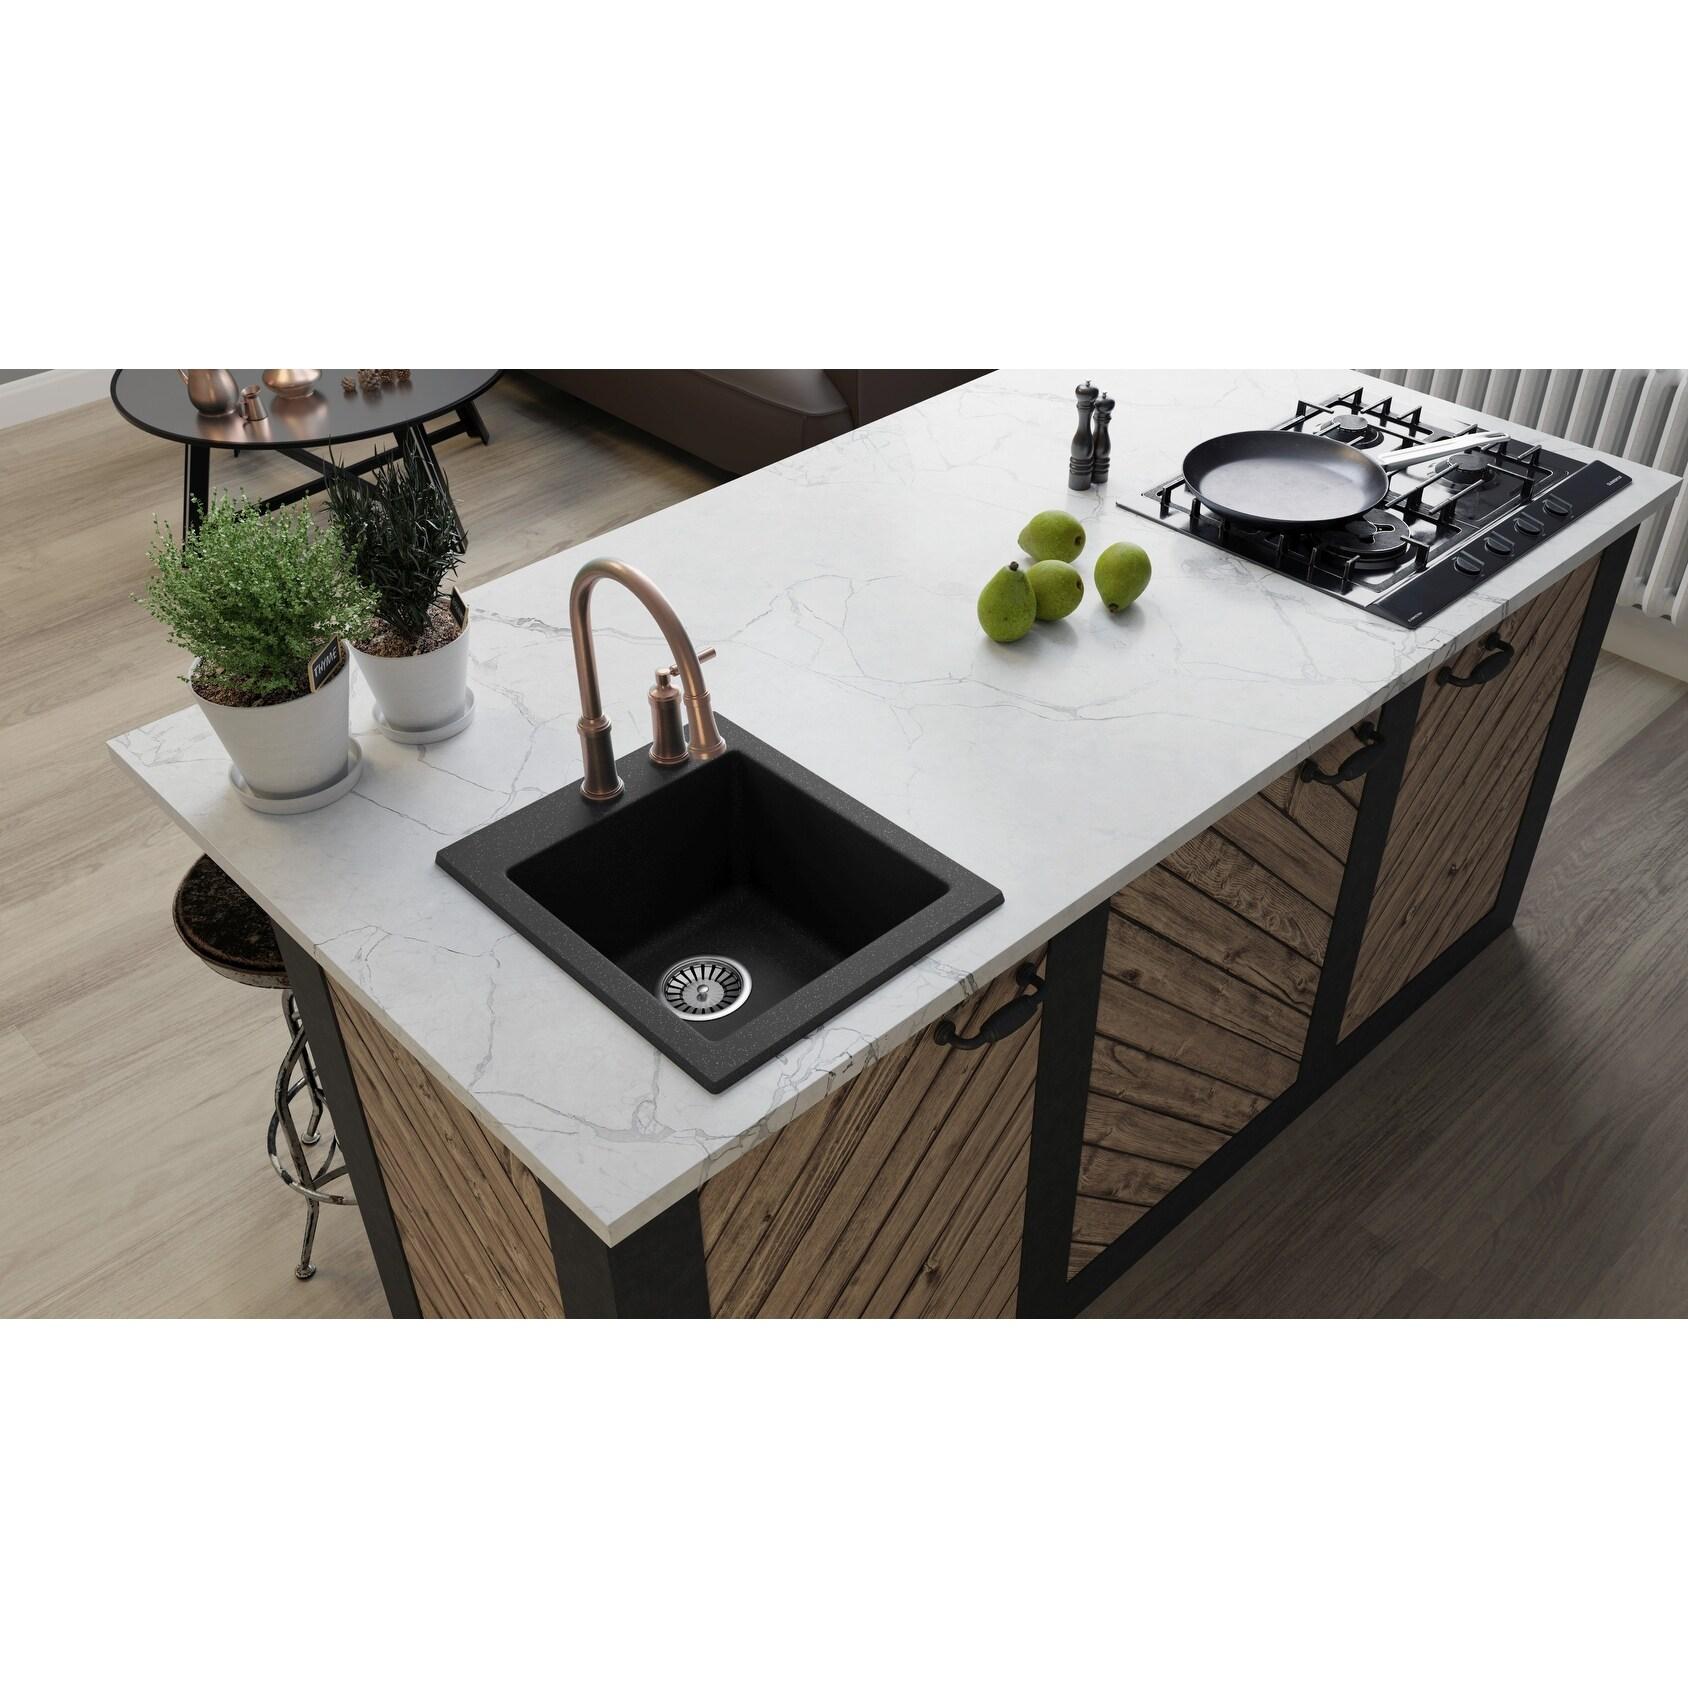 Lavello Granite Composite 16 Drop In Single Bowl Kitchen Sink Notte 1 Hole On Sale Overstock 30997683 Black Metallic